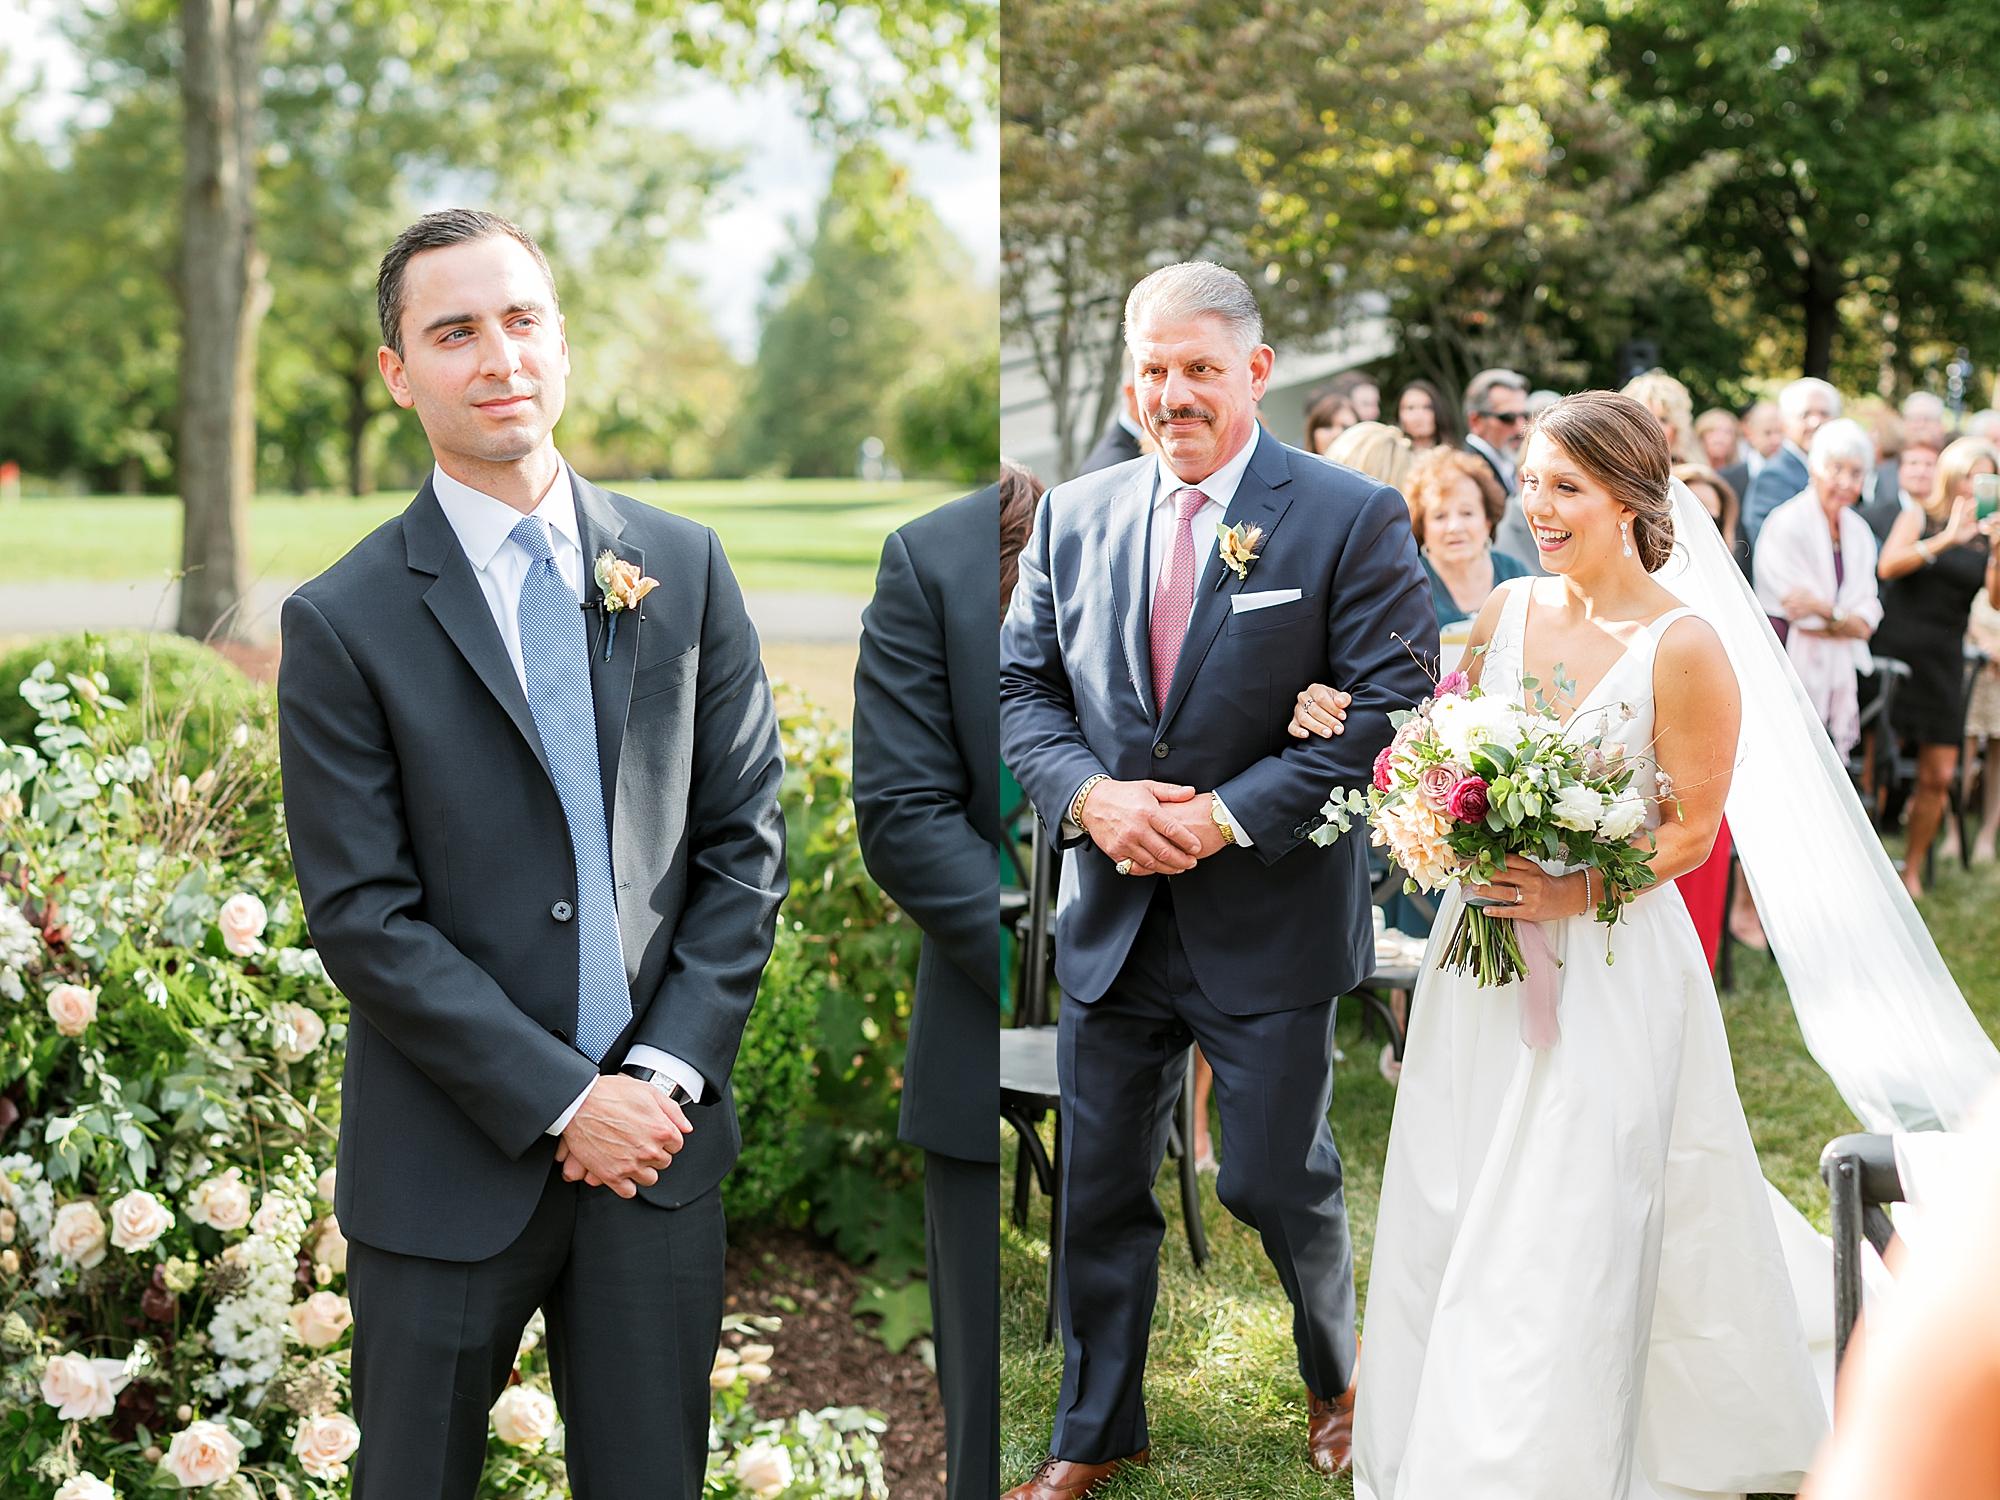 Princeton New Jersey Film Wedding Photographer Princeton University Wedding Photography by Magdalena Studios NJ Wedding Photographer35